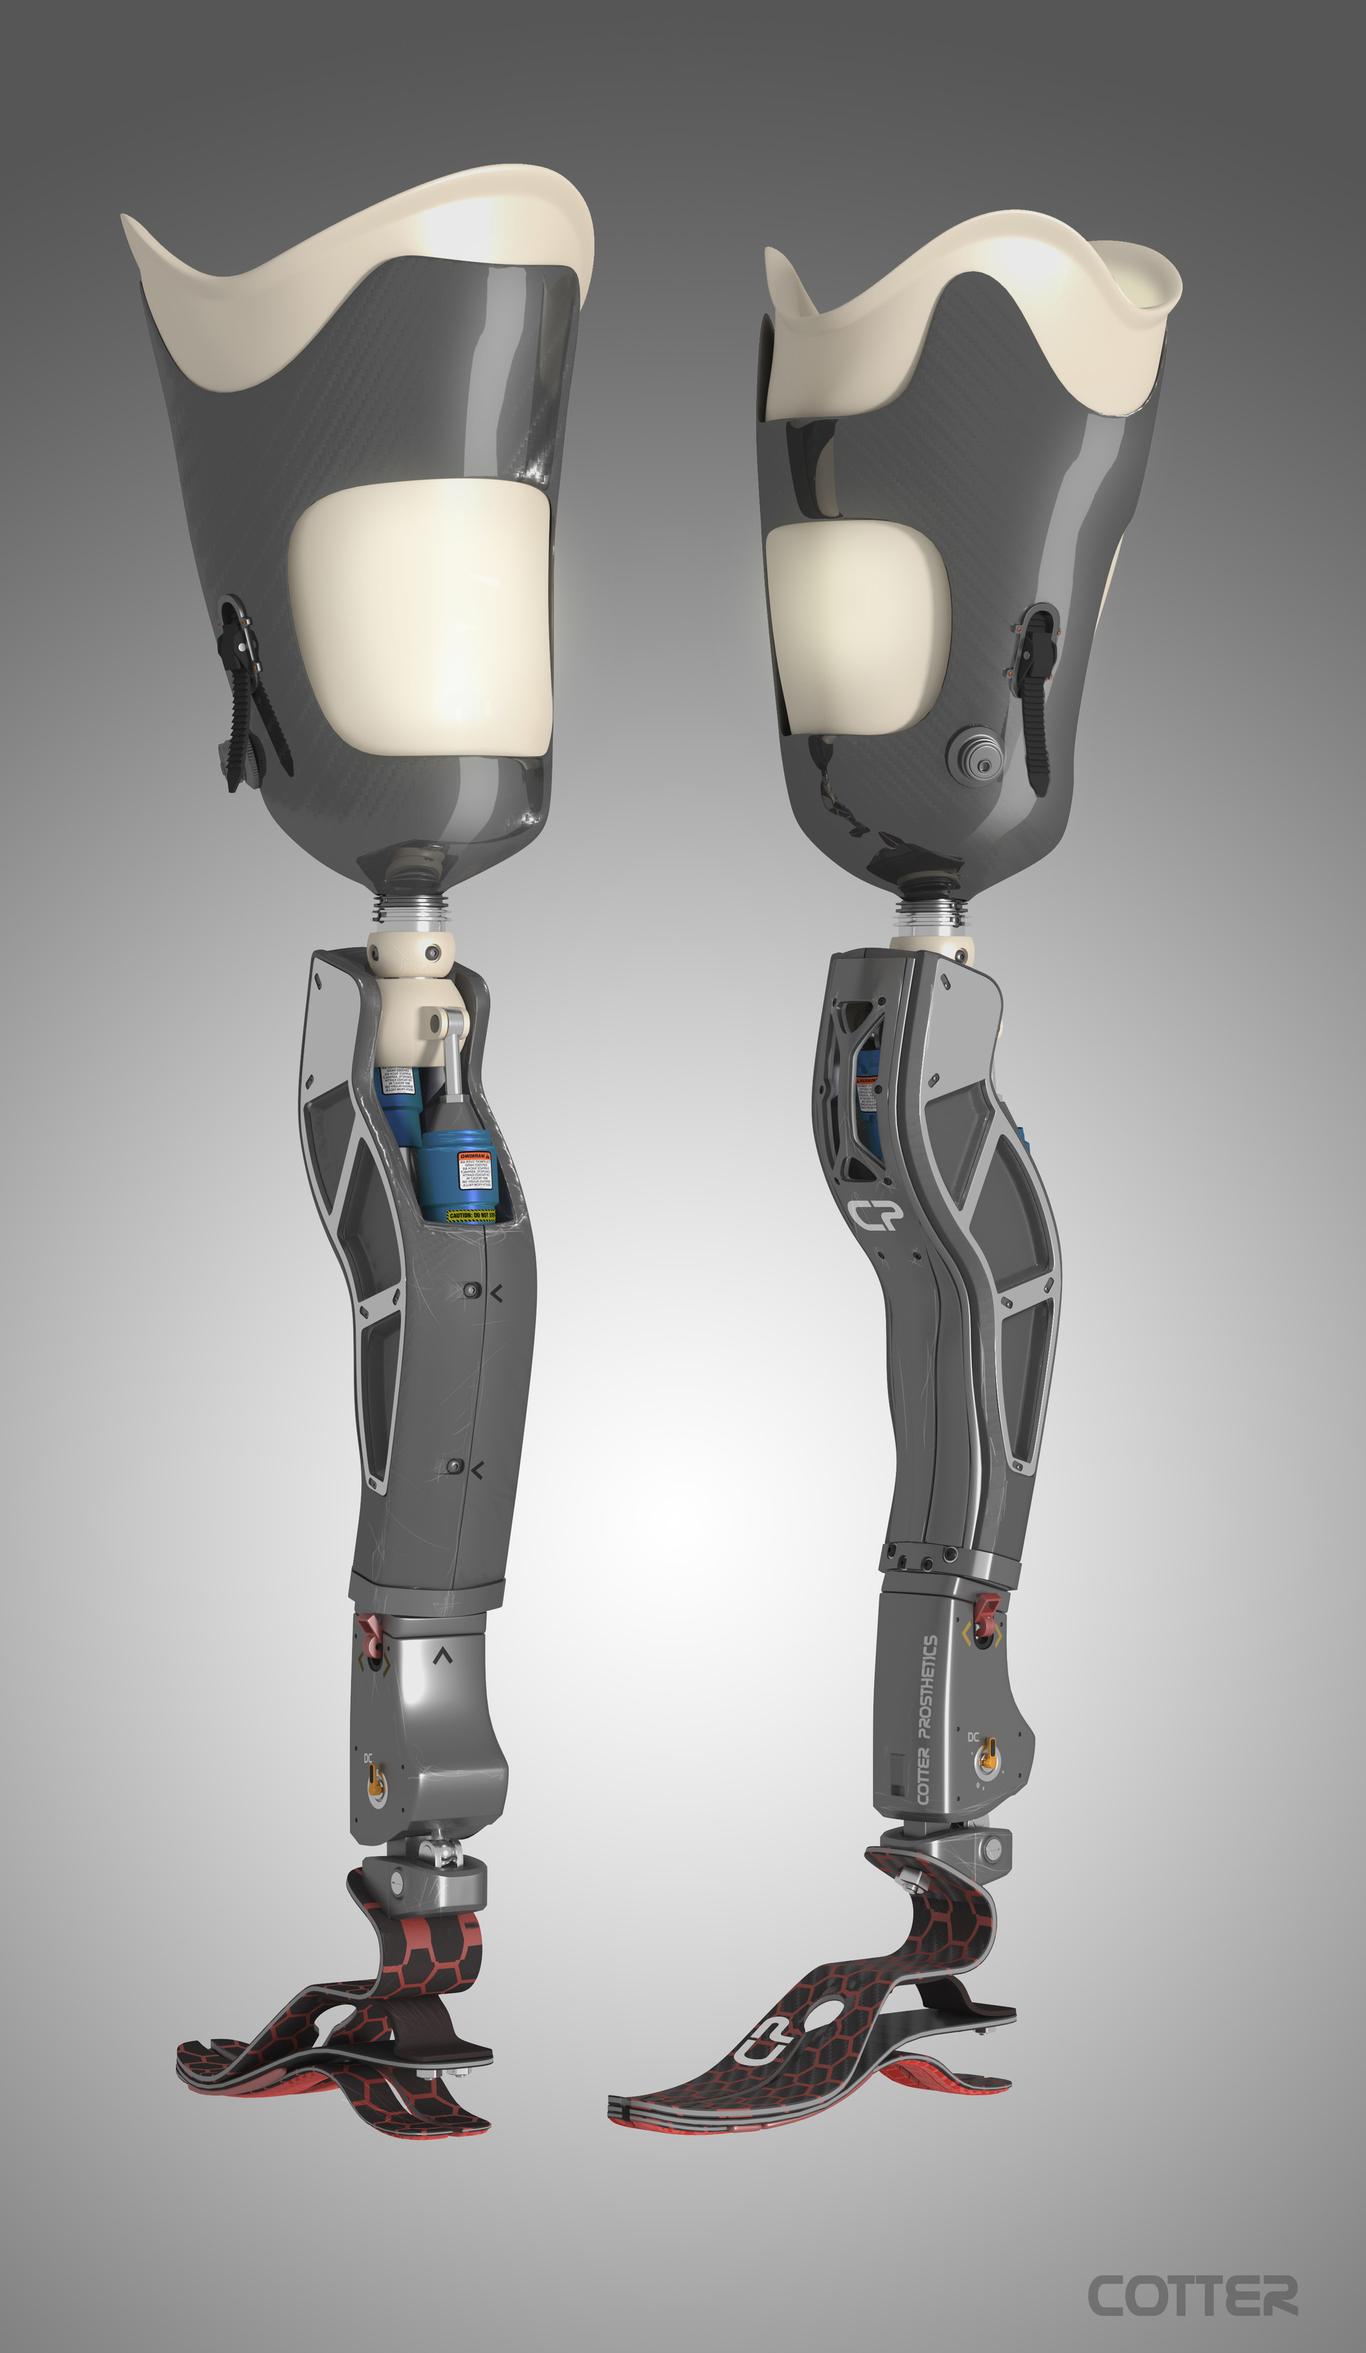 Parallaxpunch prosthetic leg desig 1 e8ae6525 ncxl